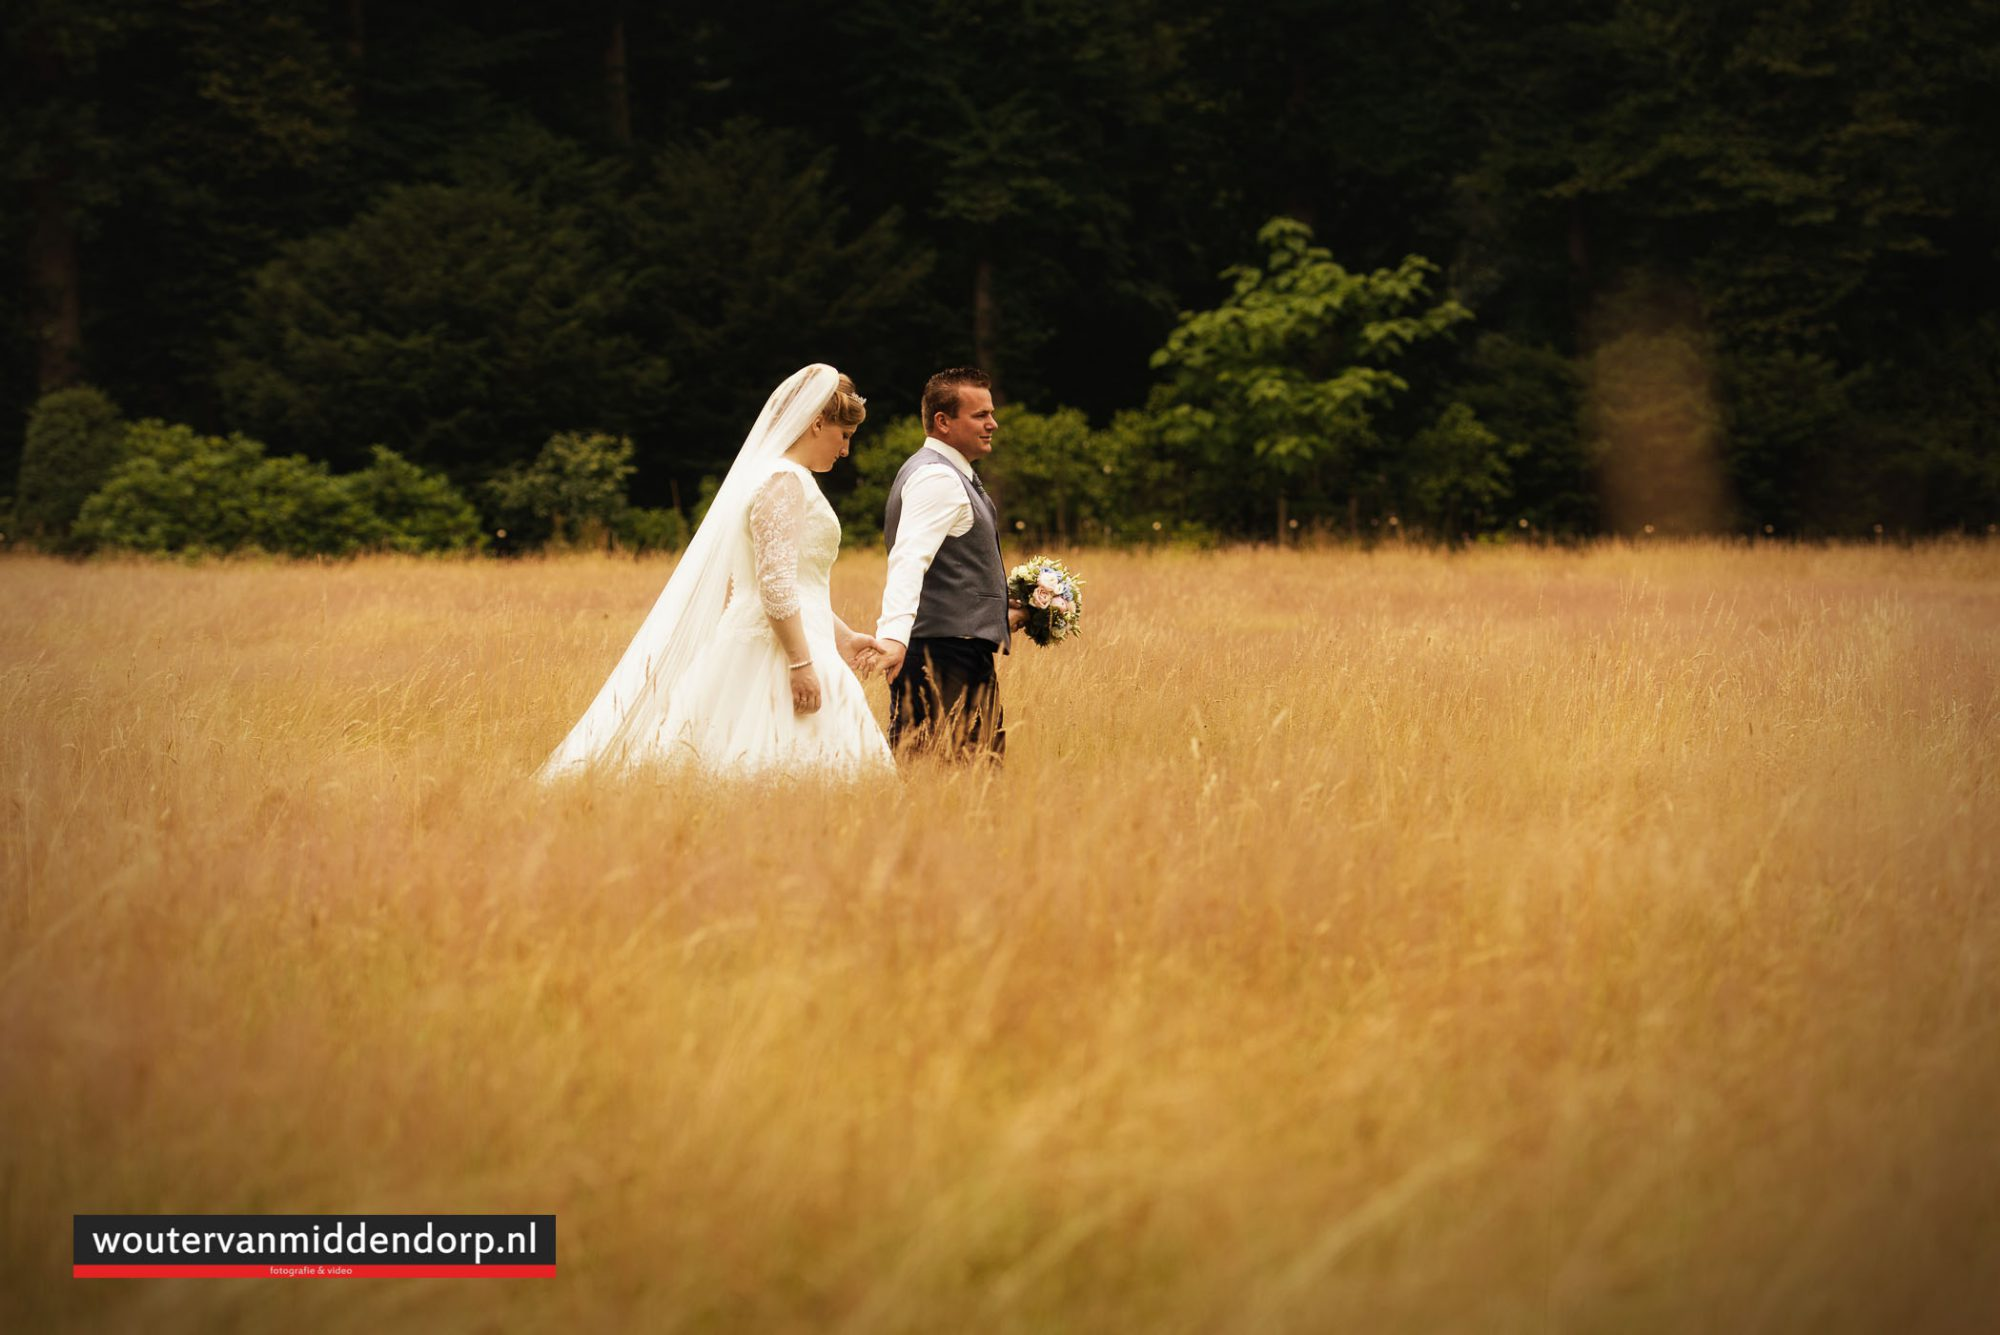 trouwfotograaf-wouter-van-middendorp-omgeving-veluwe-barneveld-uddel-30-van-51